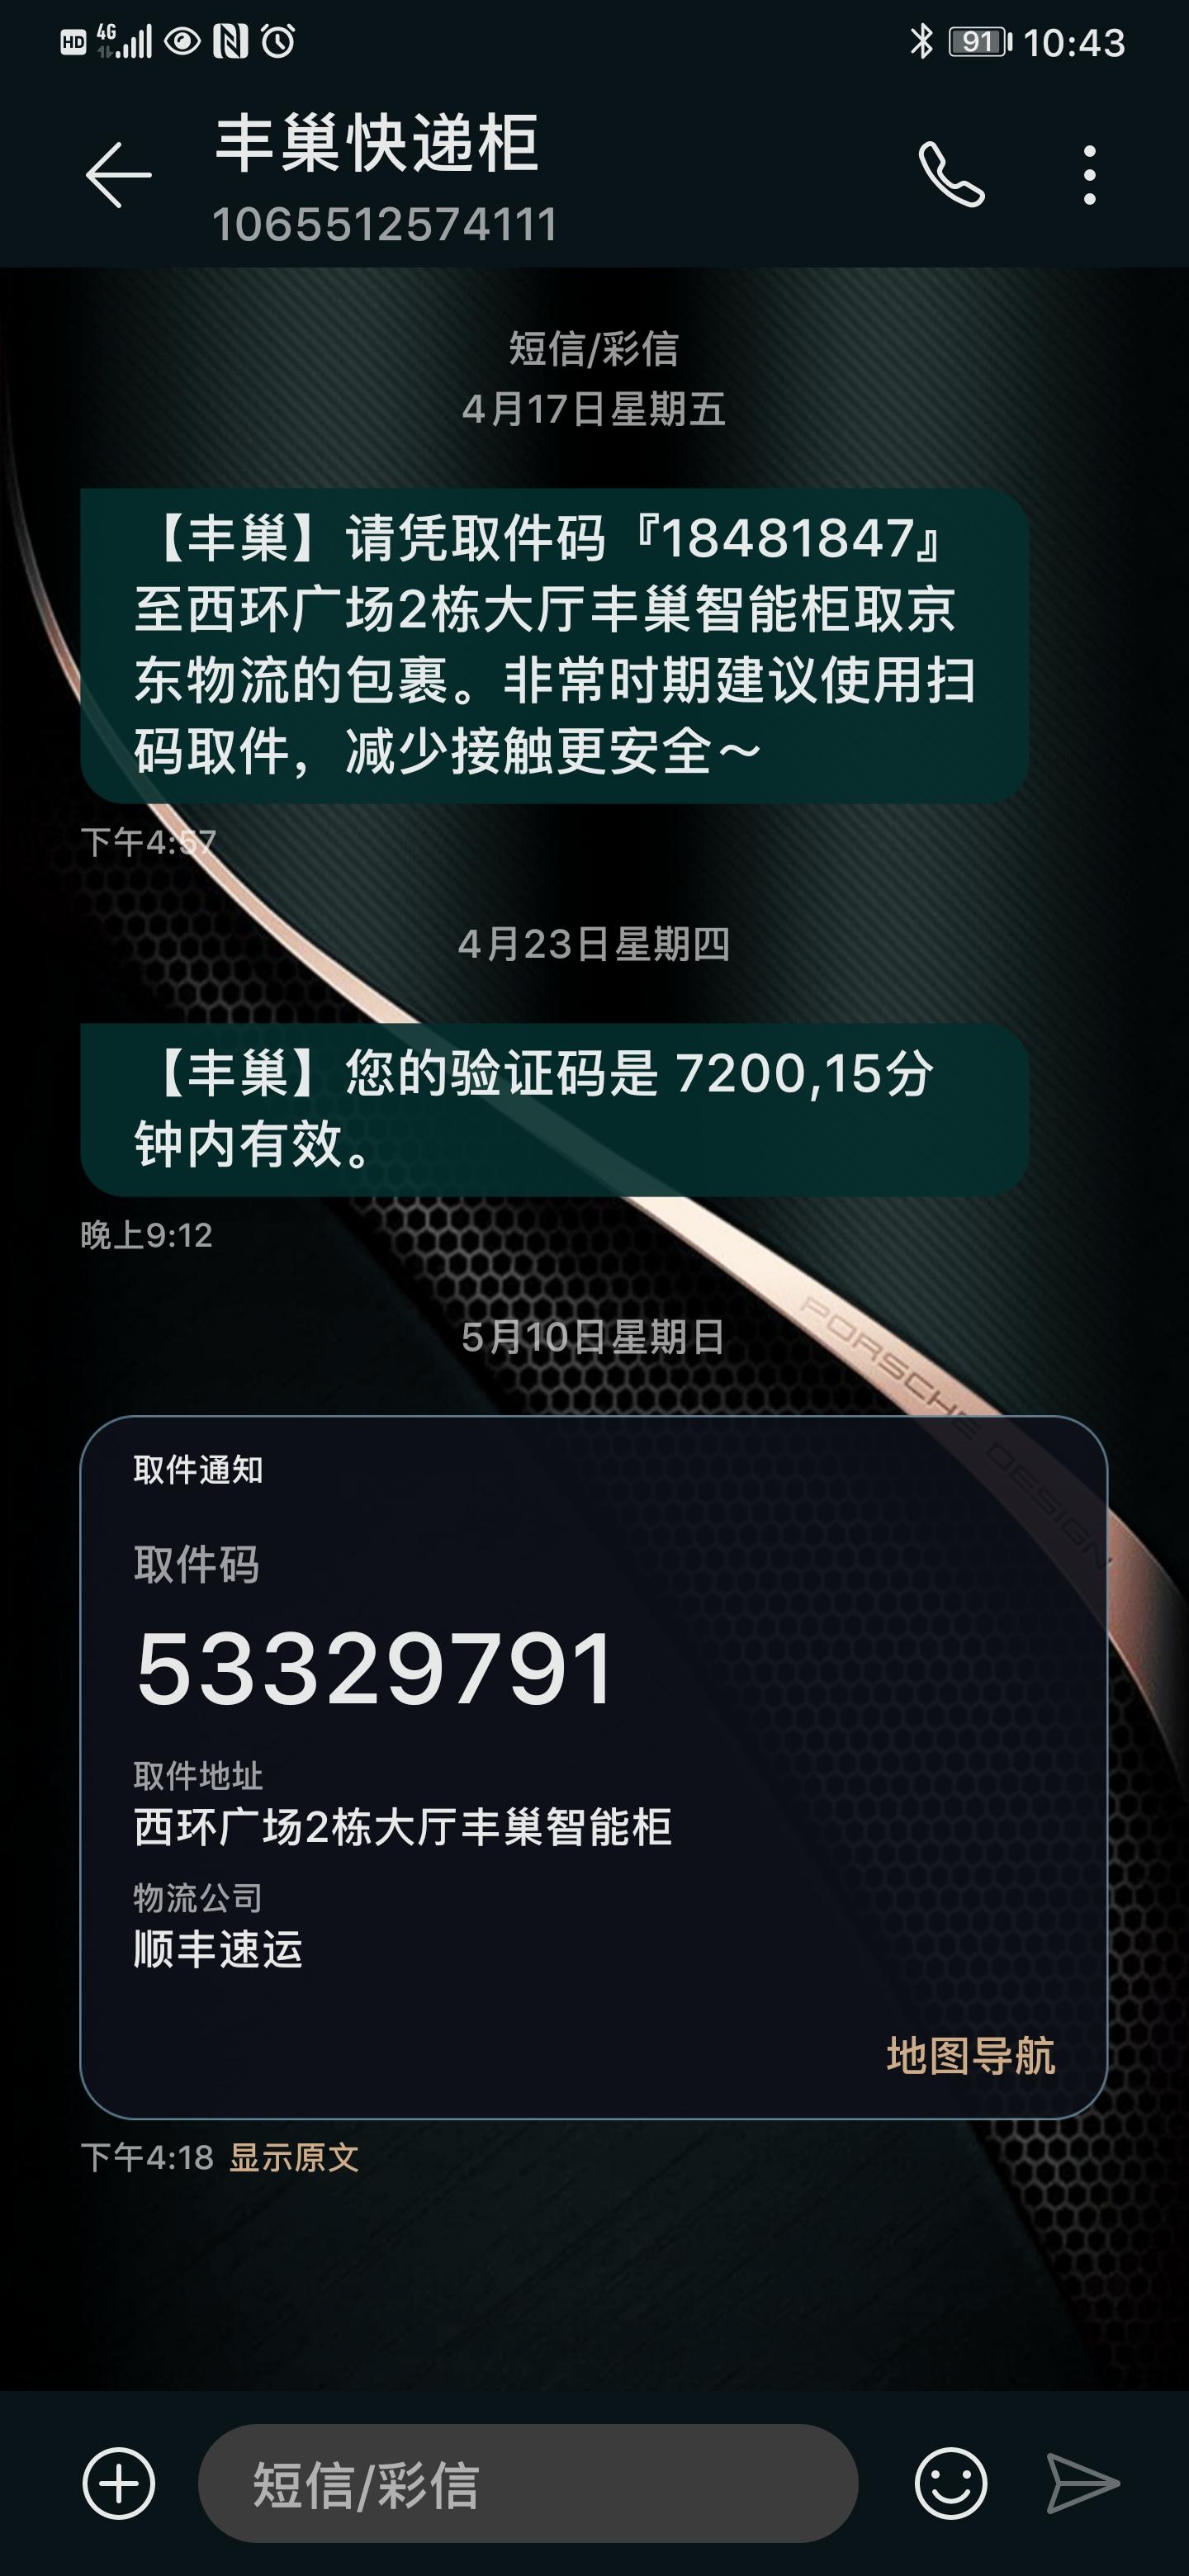 Screenshot_20200515_104320_com.android.mms.jpg